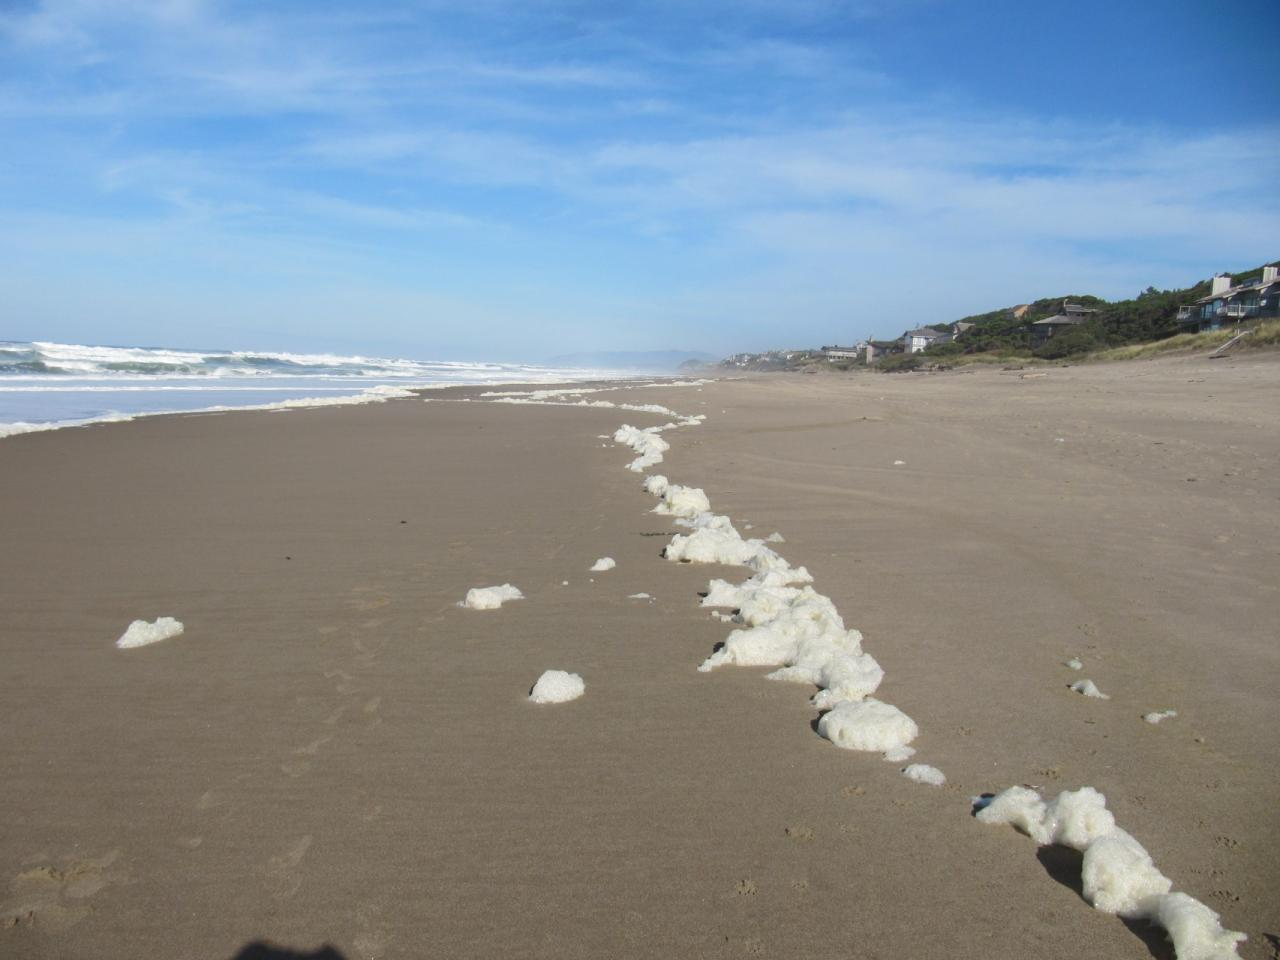 Heavy sea foam, quiet day on the beach.